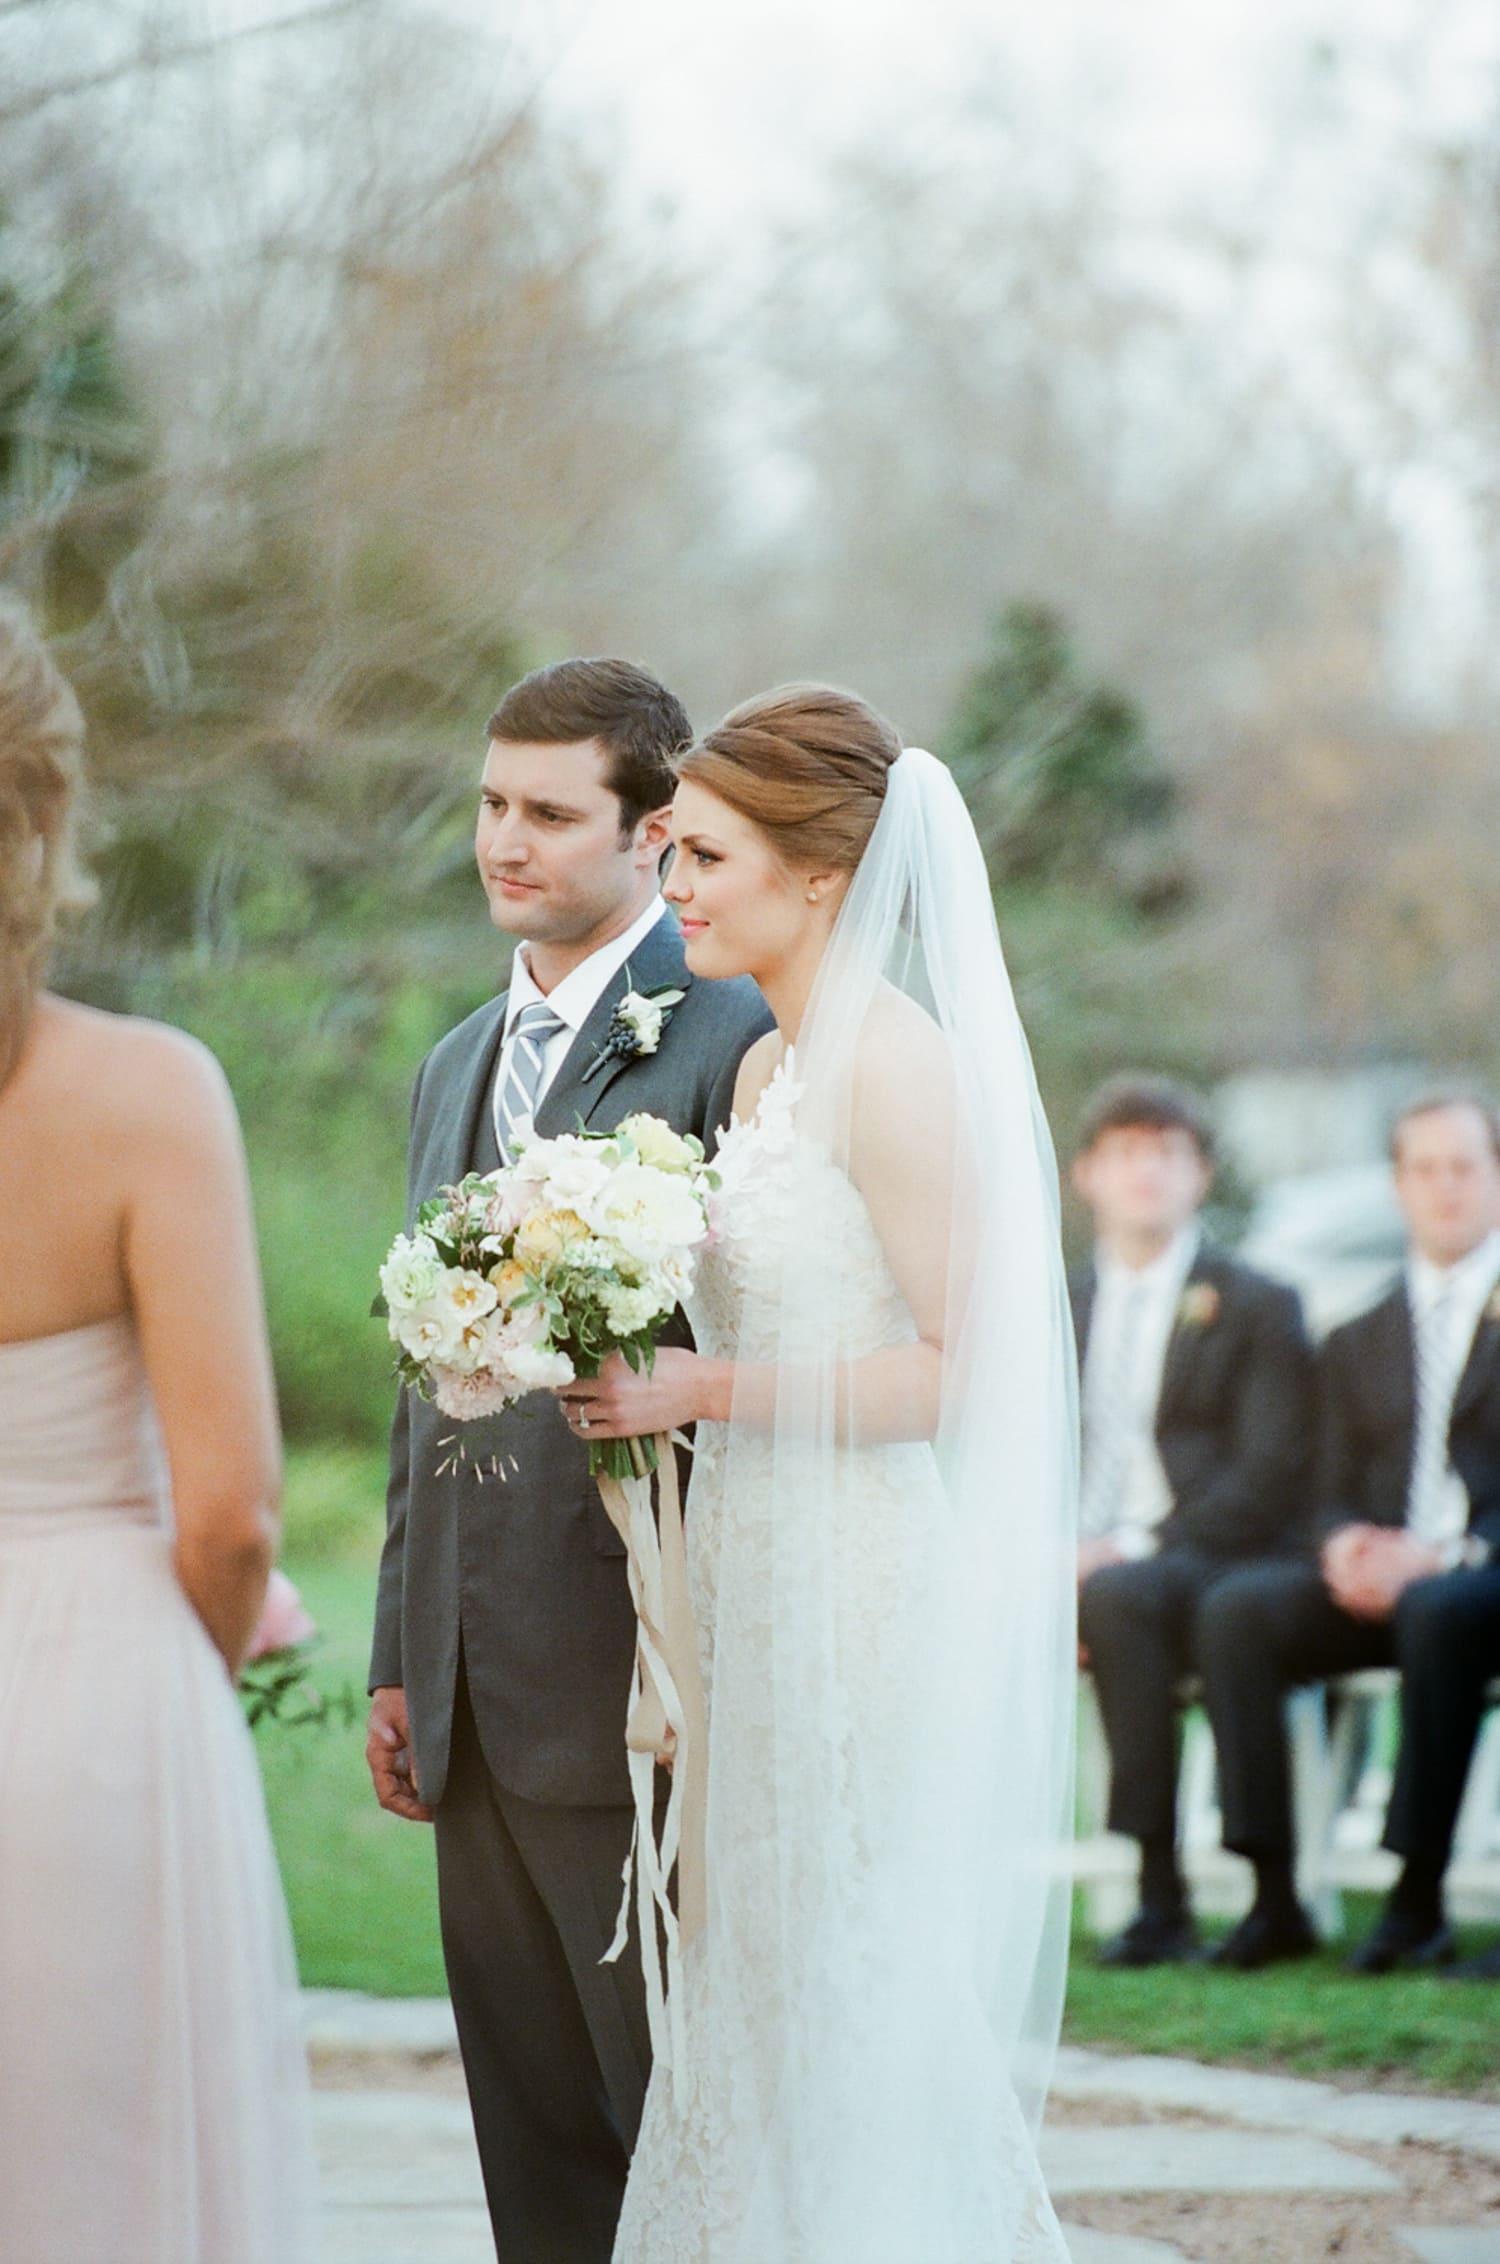 barr-mansion-wedding-25.jpg